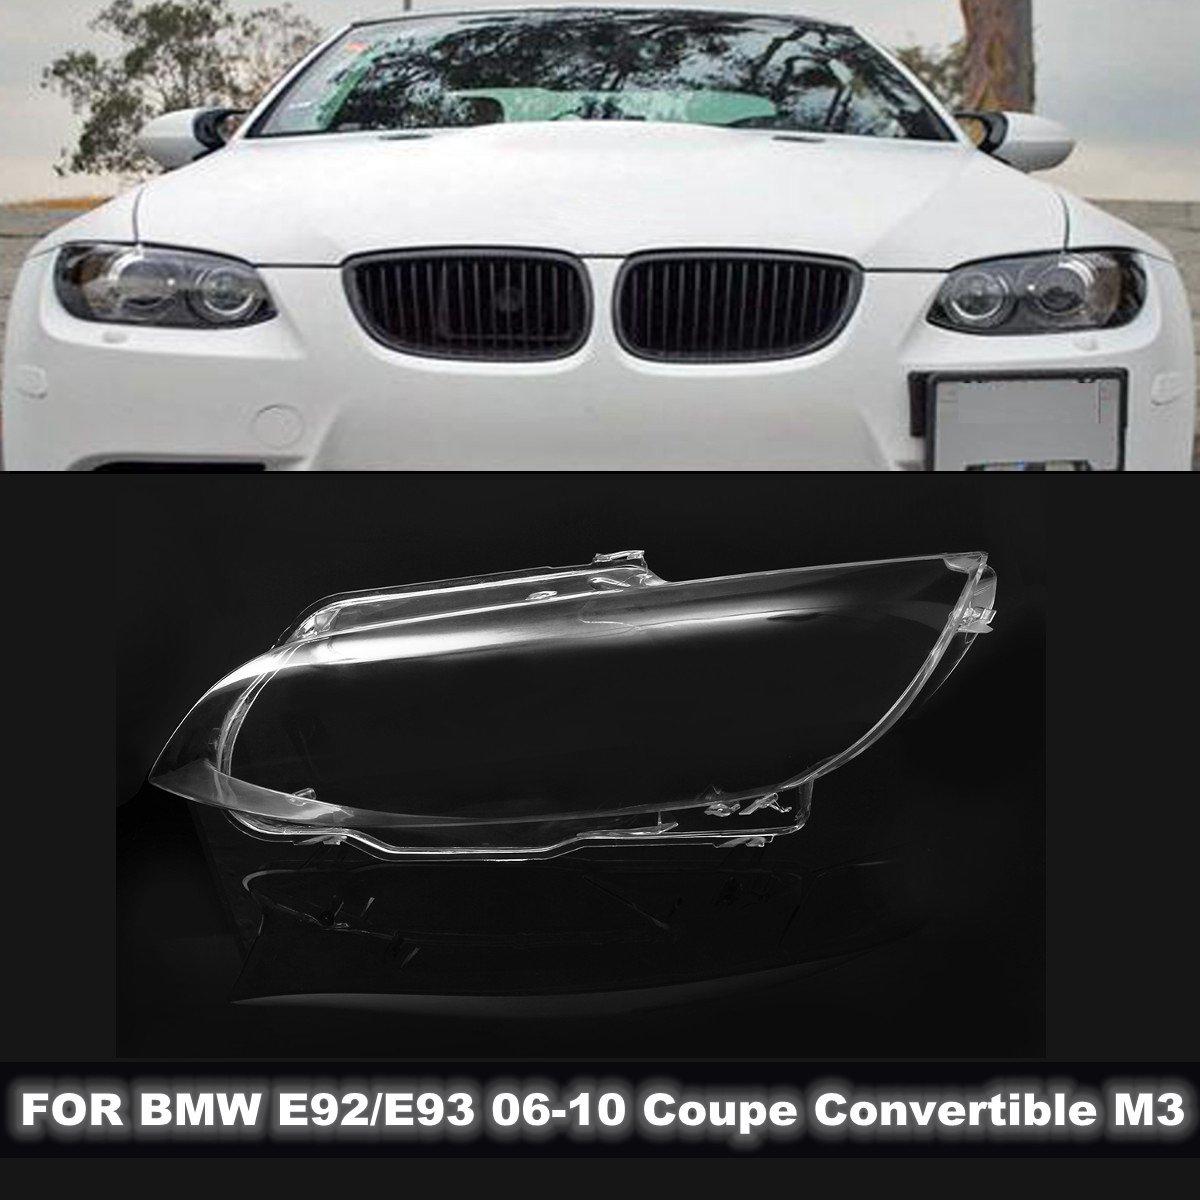 1 pcs Voiture Phare de Phare Lens Cover Gauche/Droite pour BMW E92 E93 Cabriolet Coupé M3 06-10